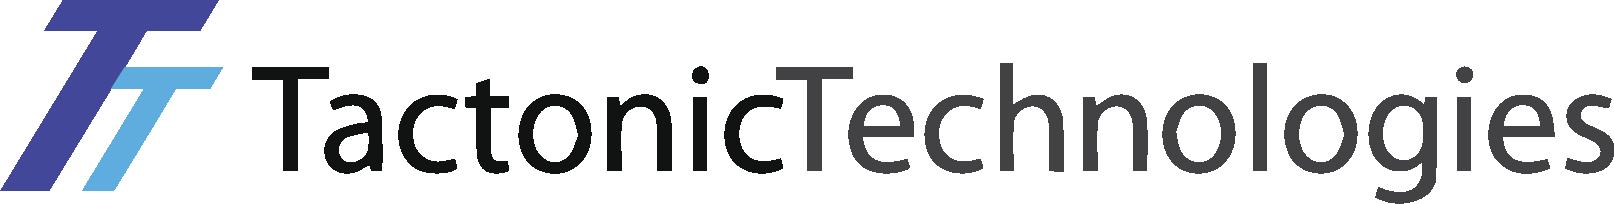 Tactonic Technologies